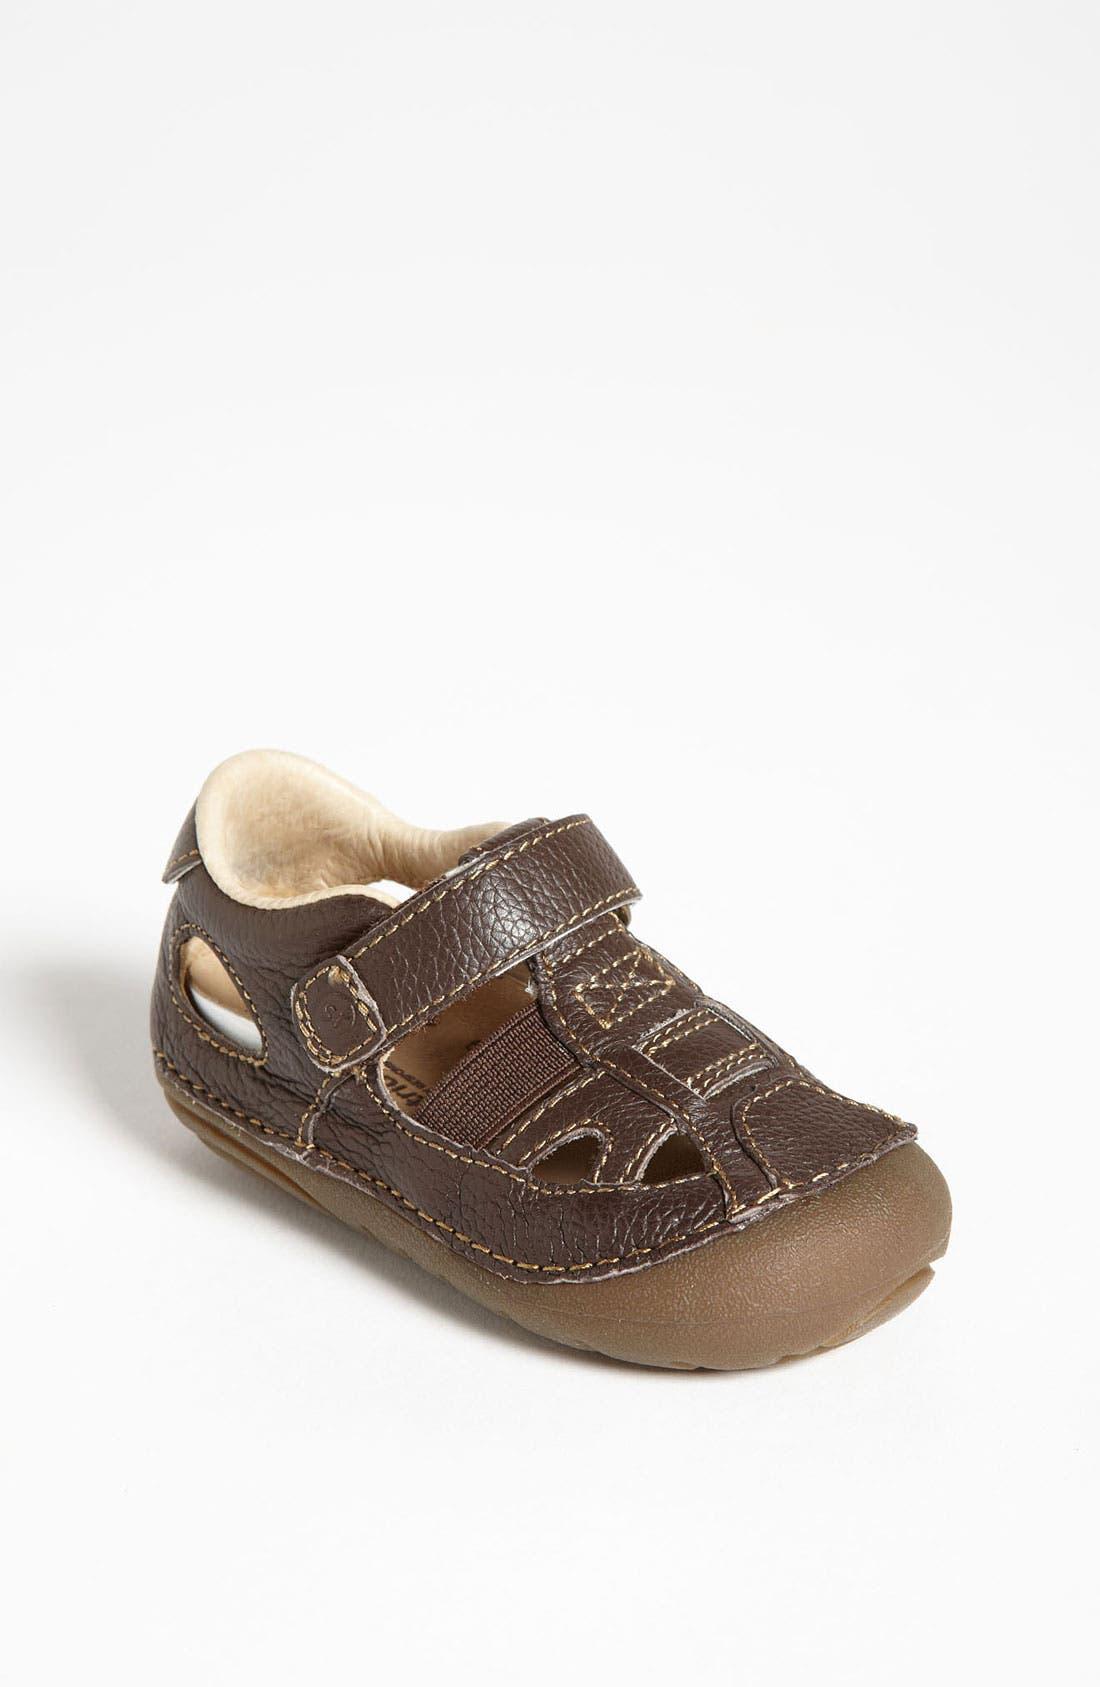 Alternate Image 1 Selected - Stride Rite 'Tony' Sandal (Baby & Walker)